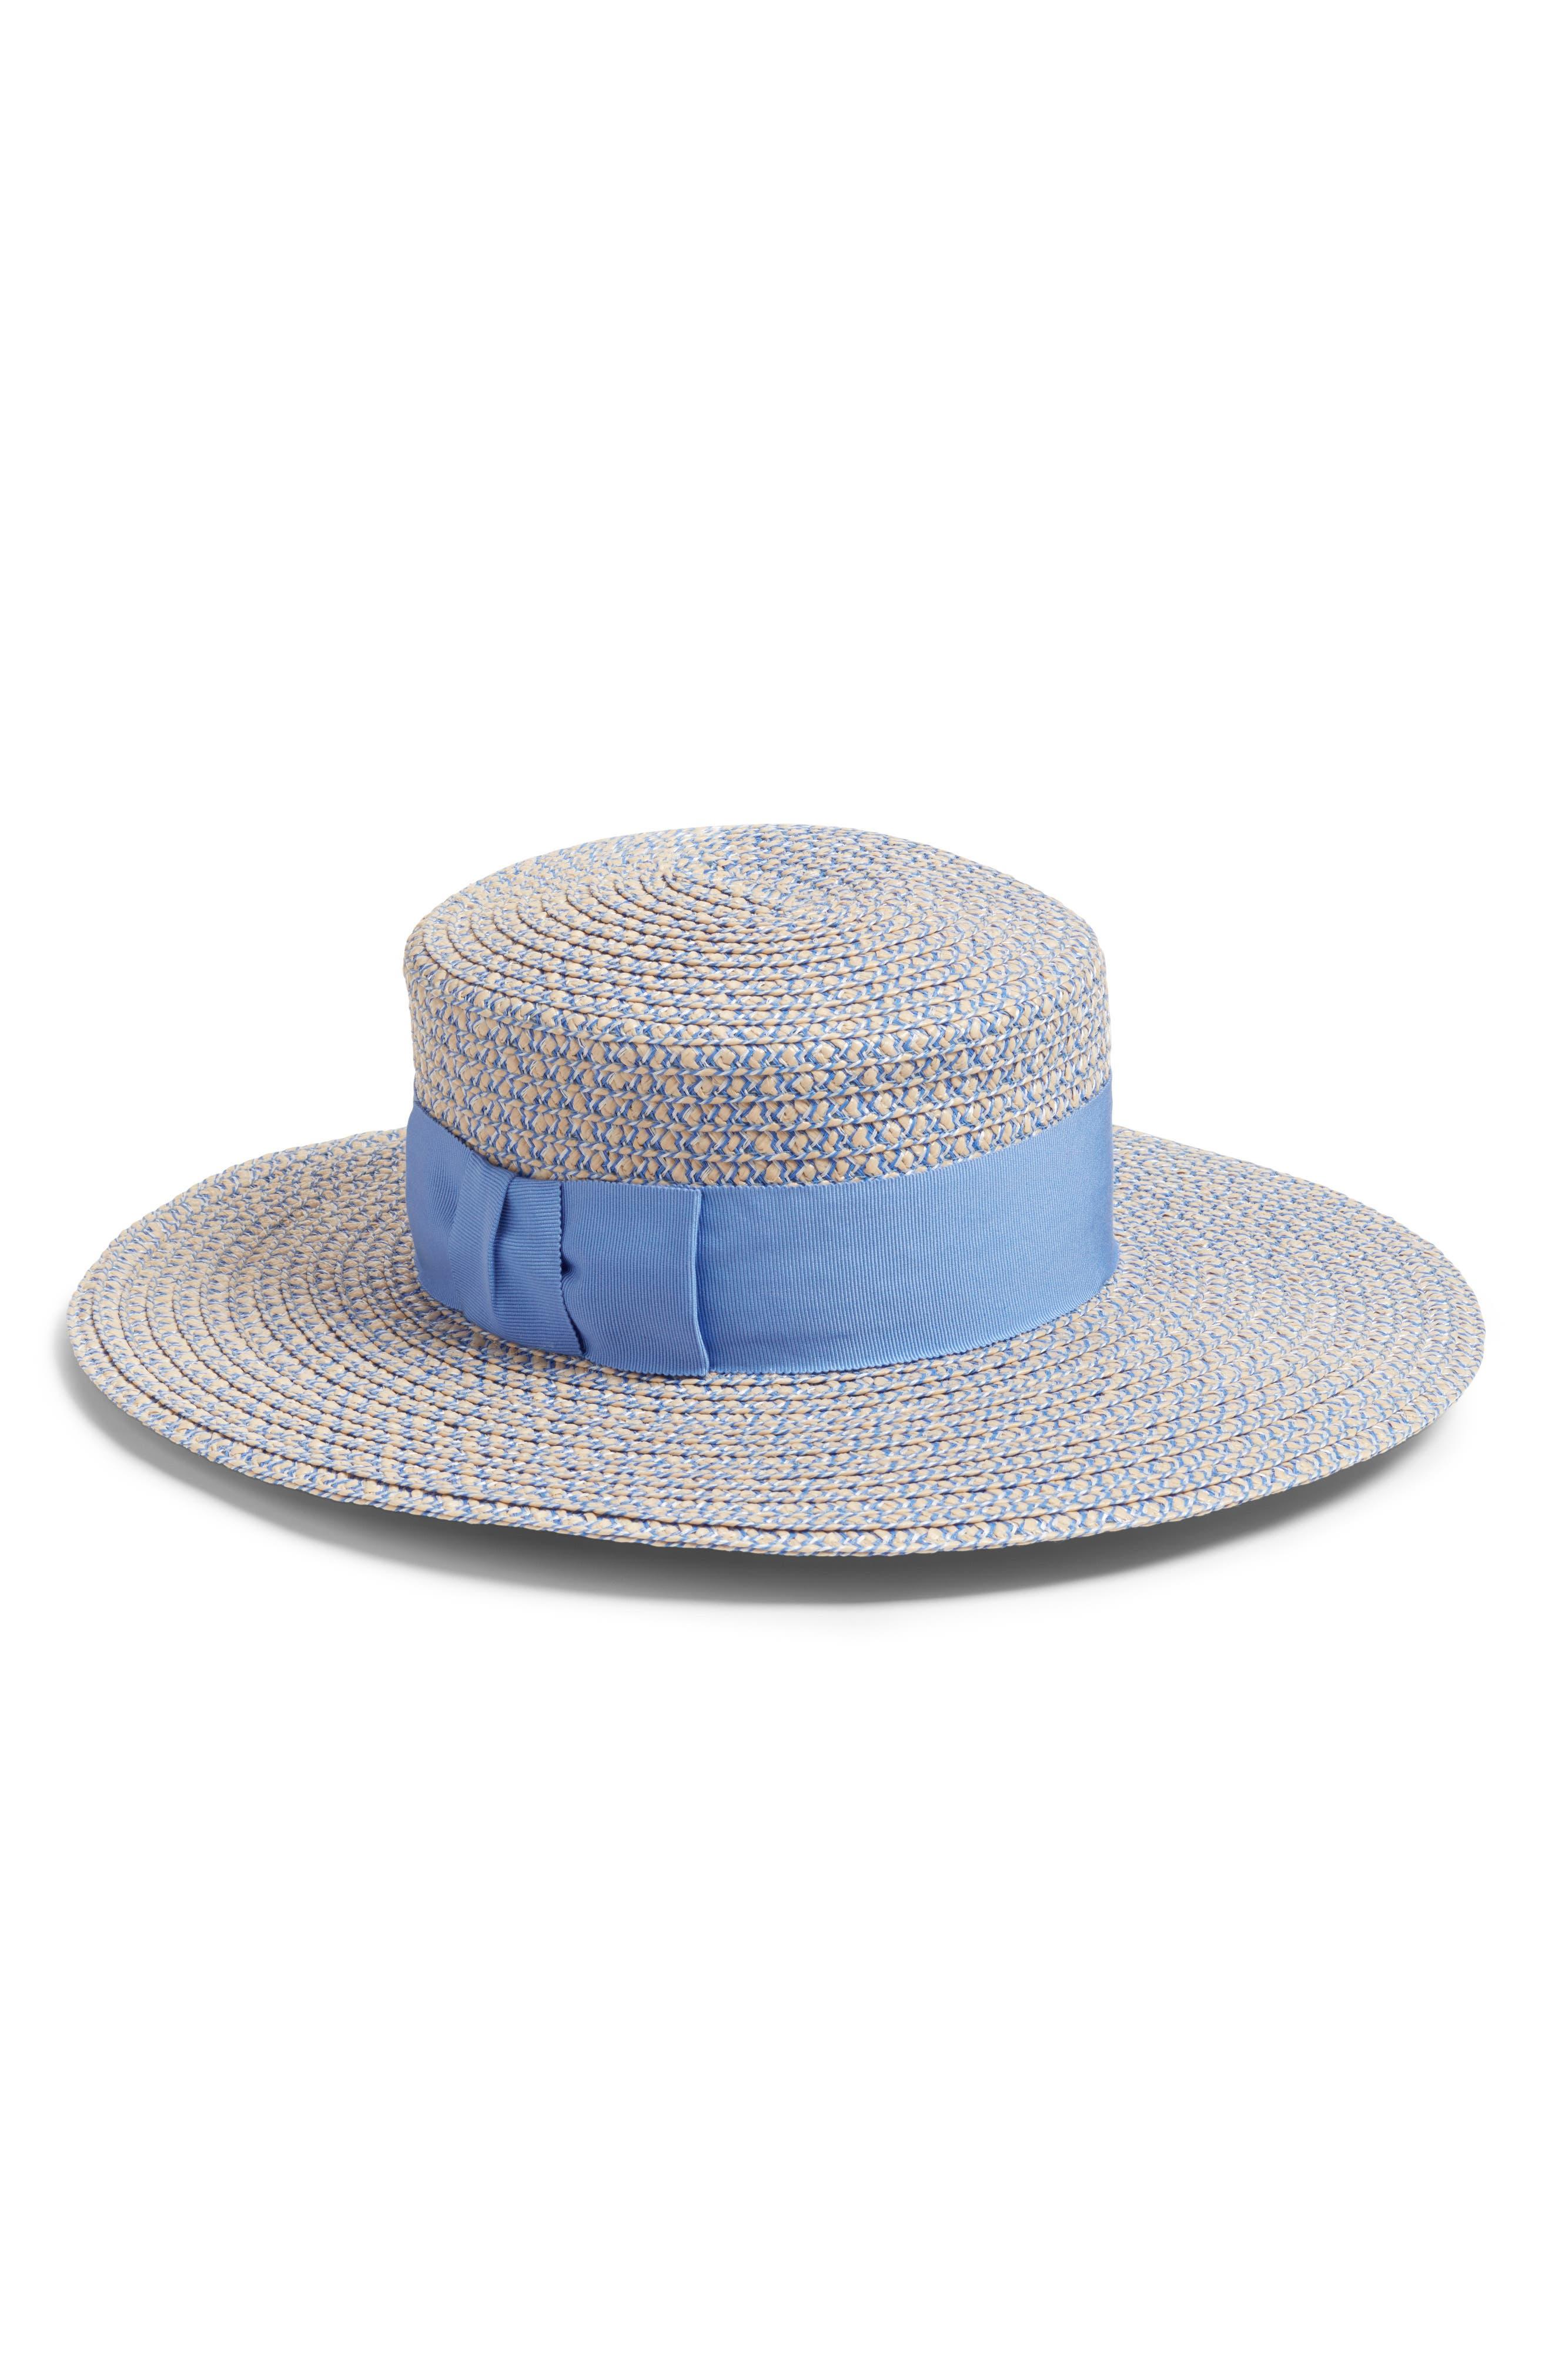 'Gondolier' Boater Hat,                         Main,                         color, Cream/ Blue Tweed